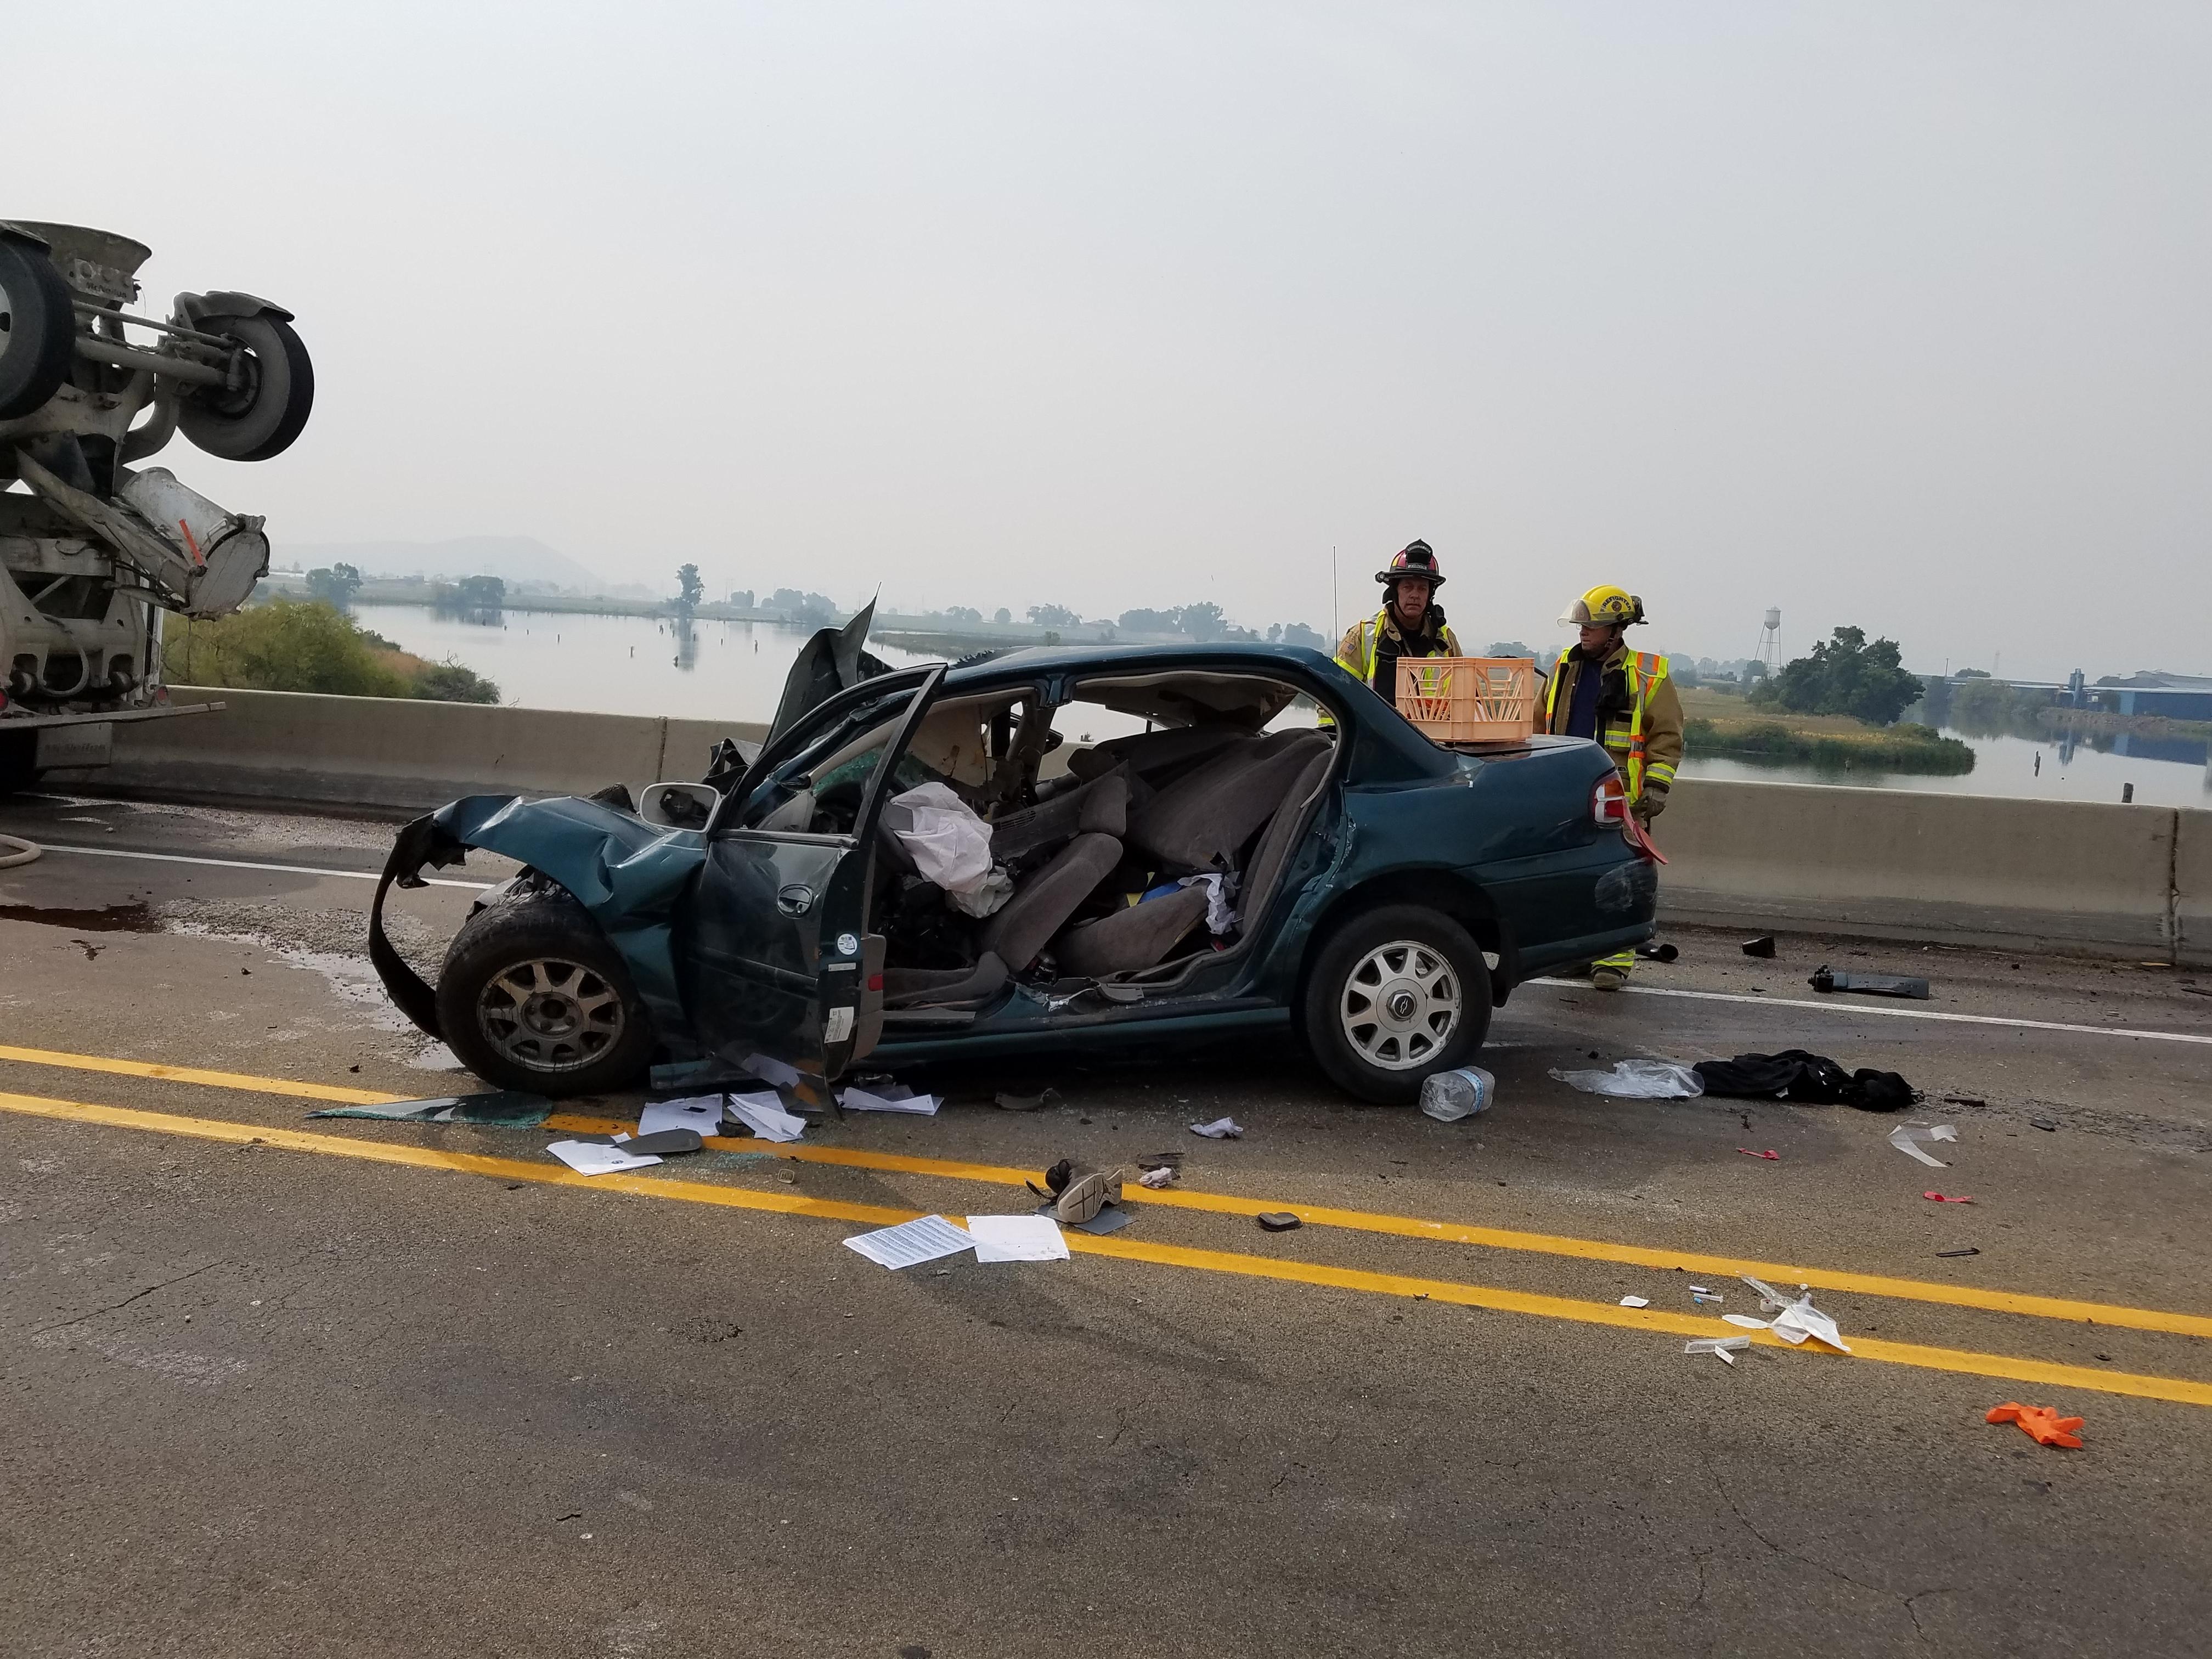 Serious Injury Crash On Hwy 140 (Southside Bypass) - Klamath Alerts